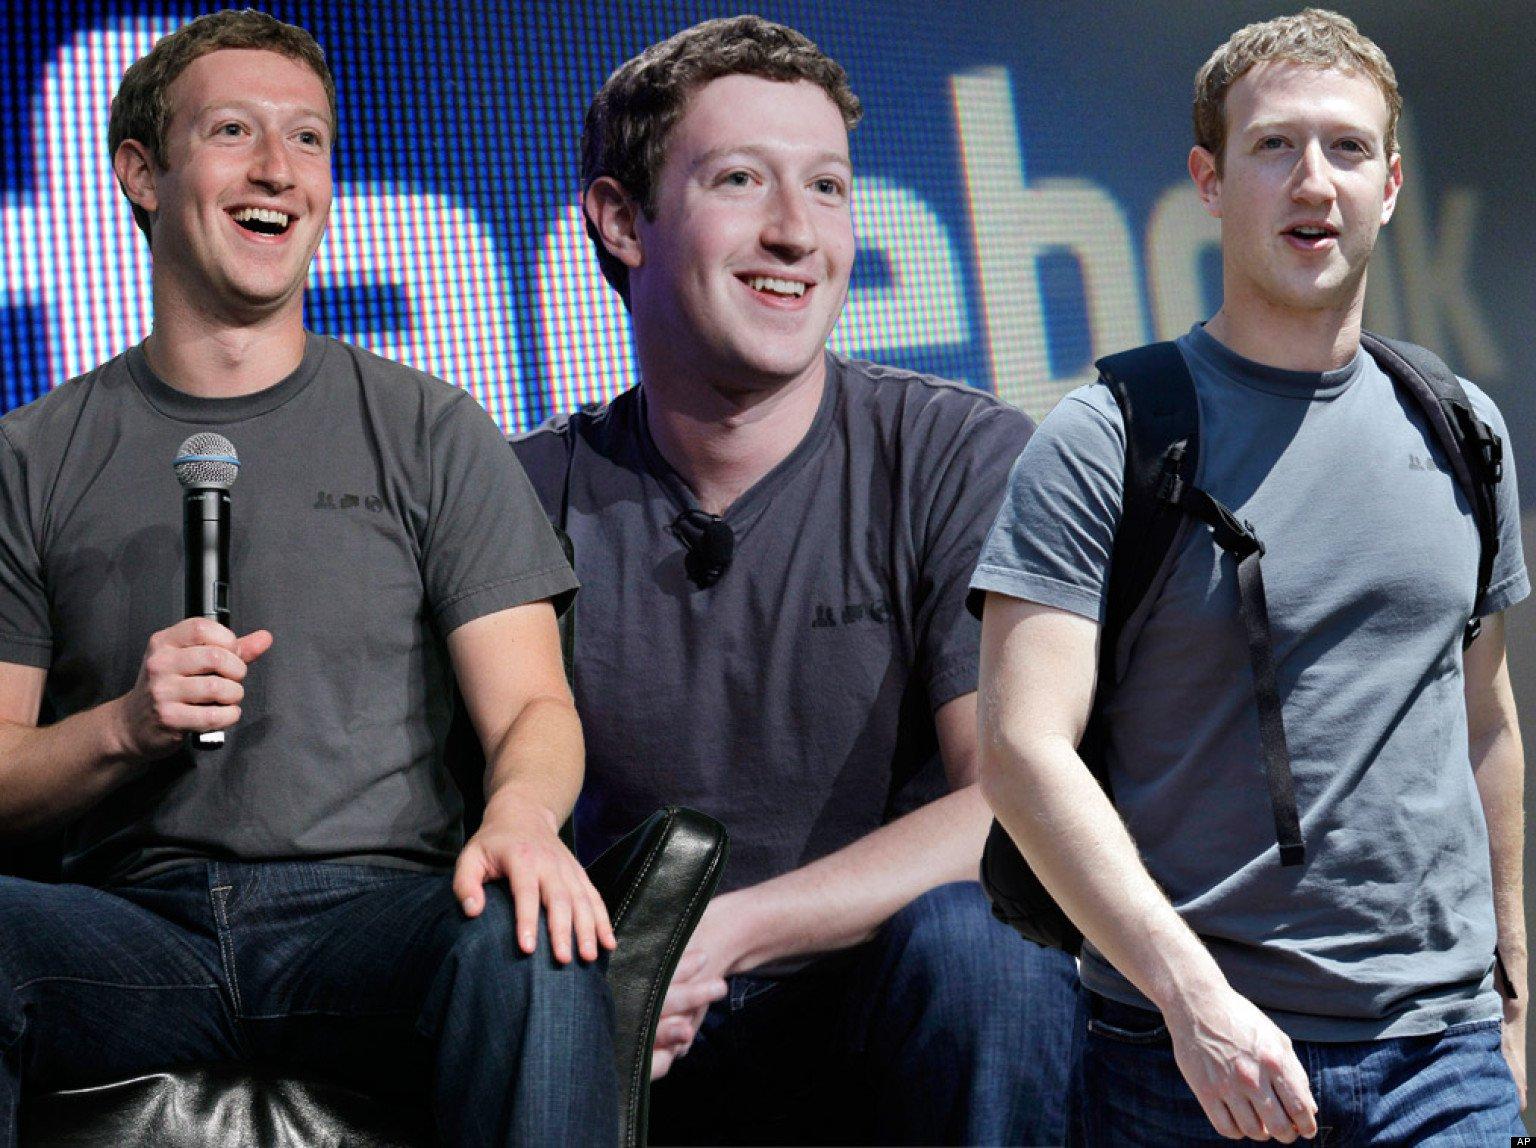 mark zuckerberg siempre viste igual